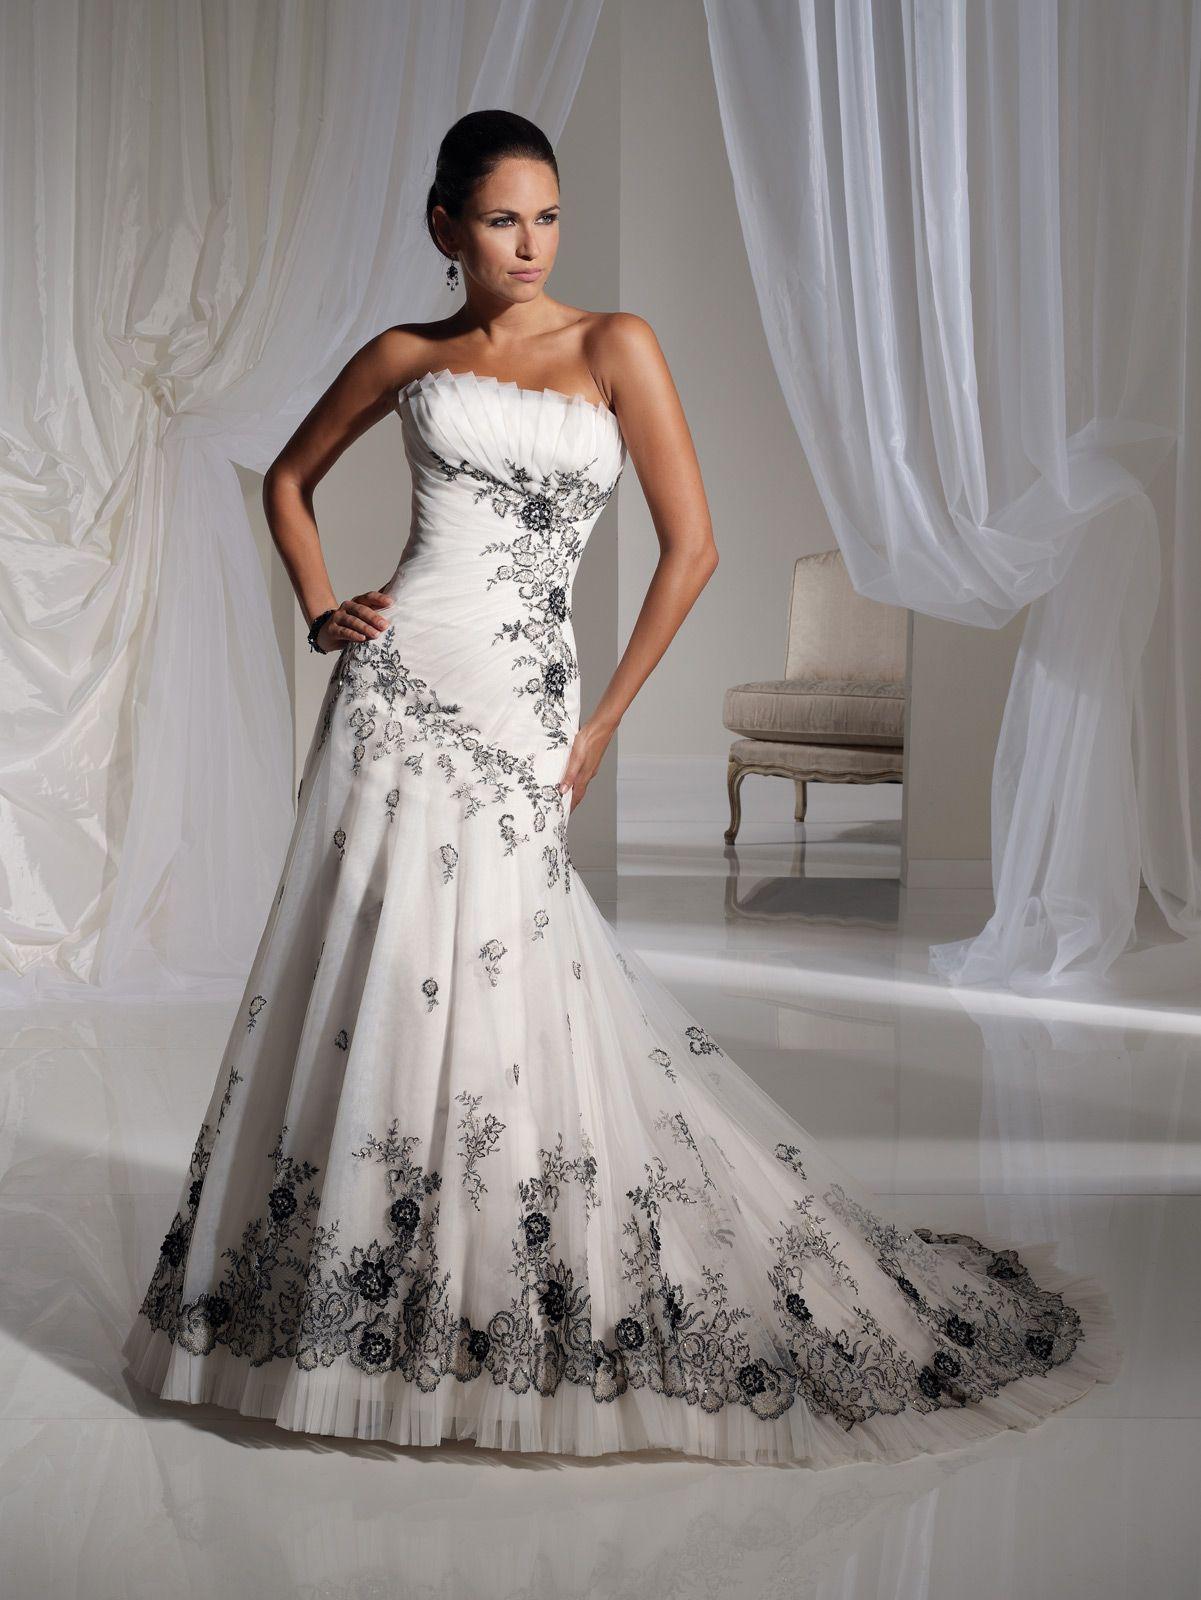 Designer wedding dresses by sophia tolli wedding dresses style designer wedding dresses by sophia tolli wedding dresses style y11121 lacey ombrellifo Gallery